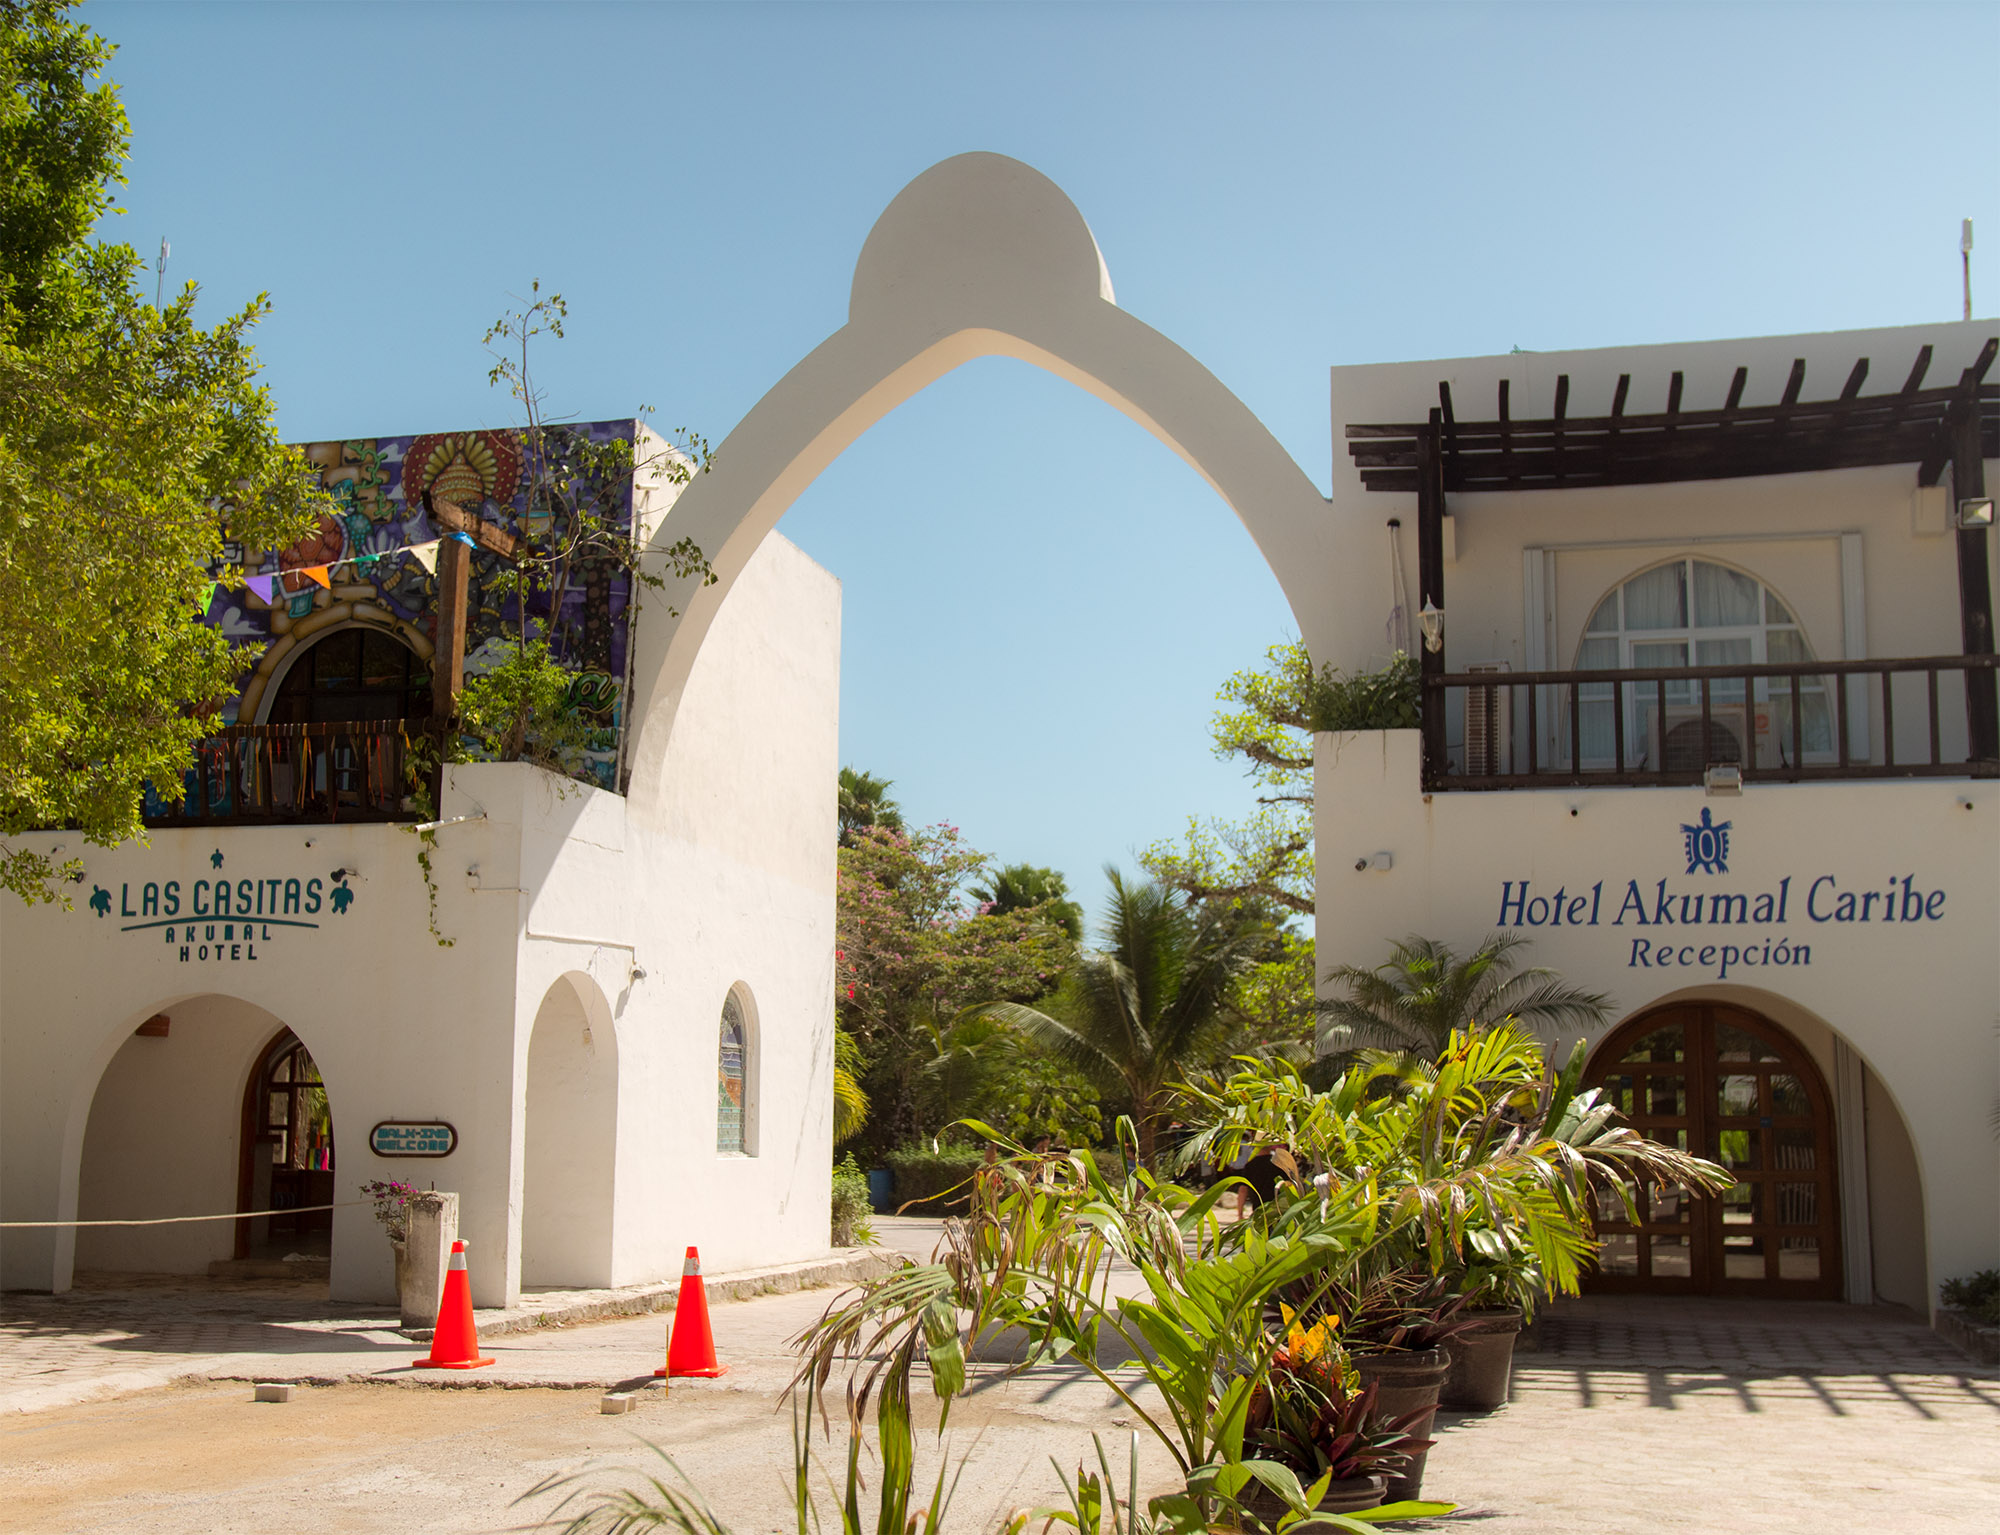 Playa del Carmen to Akumal